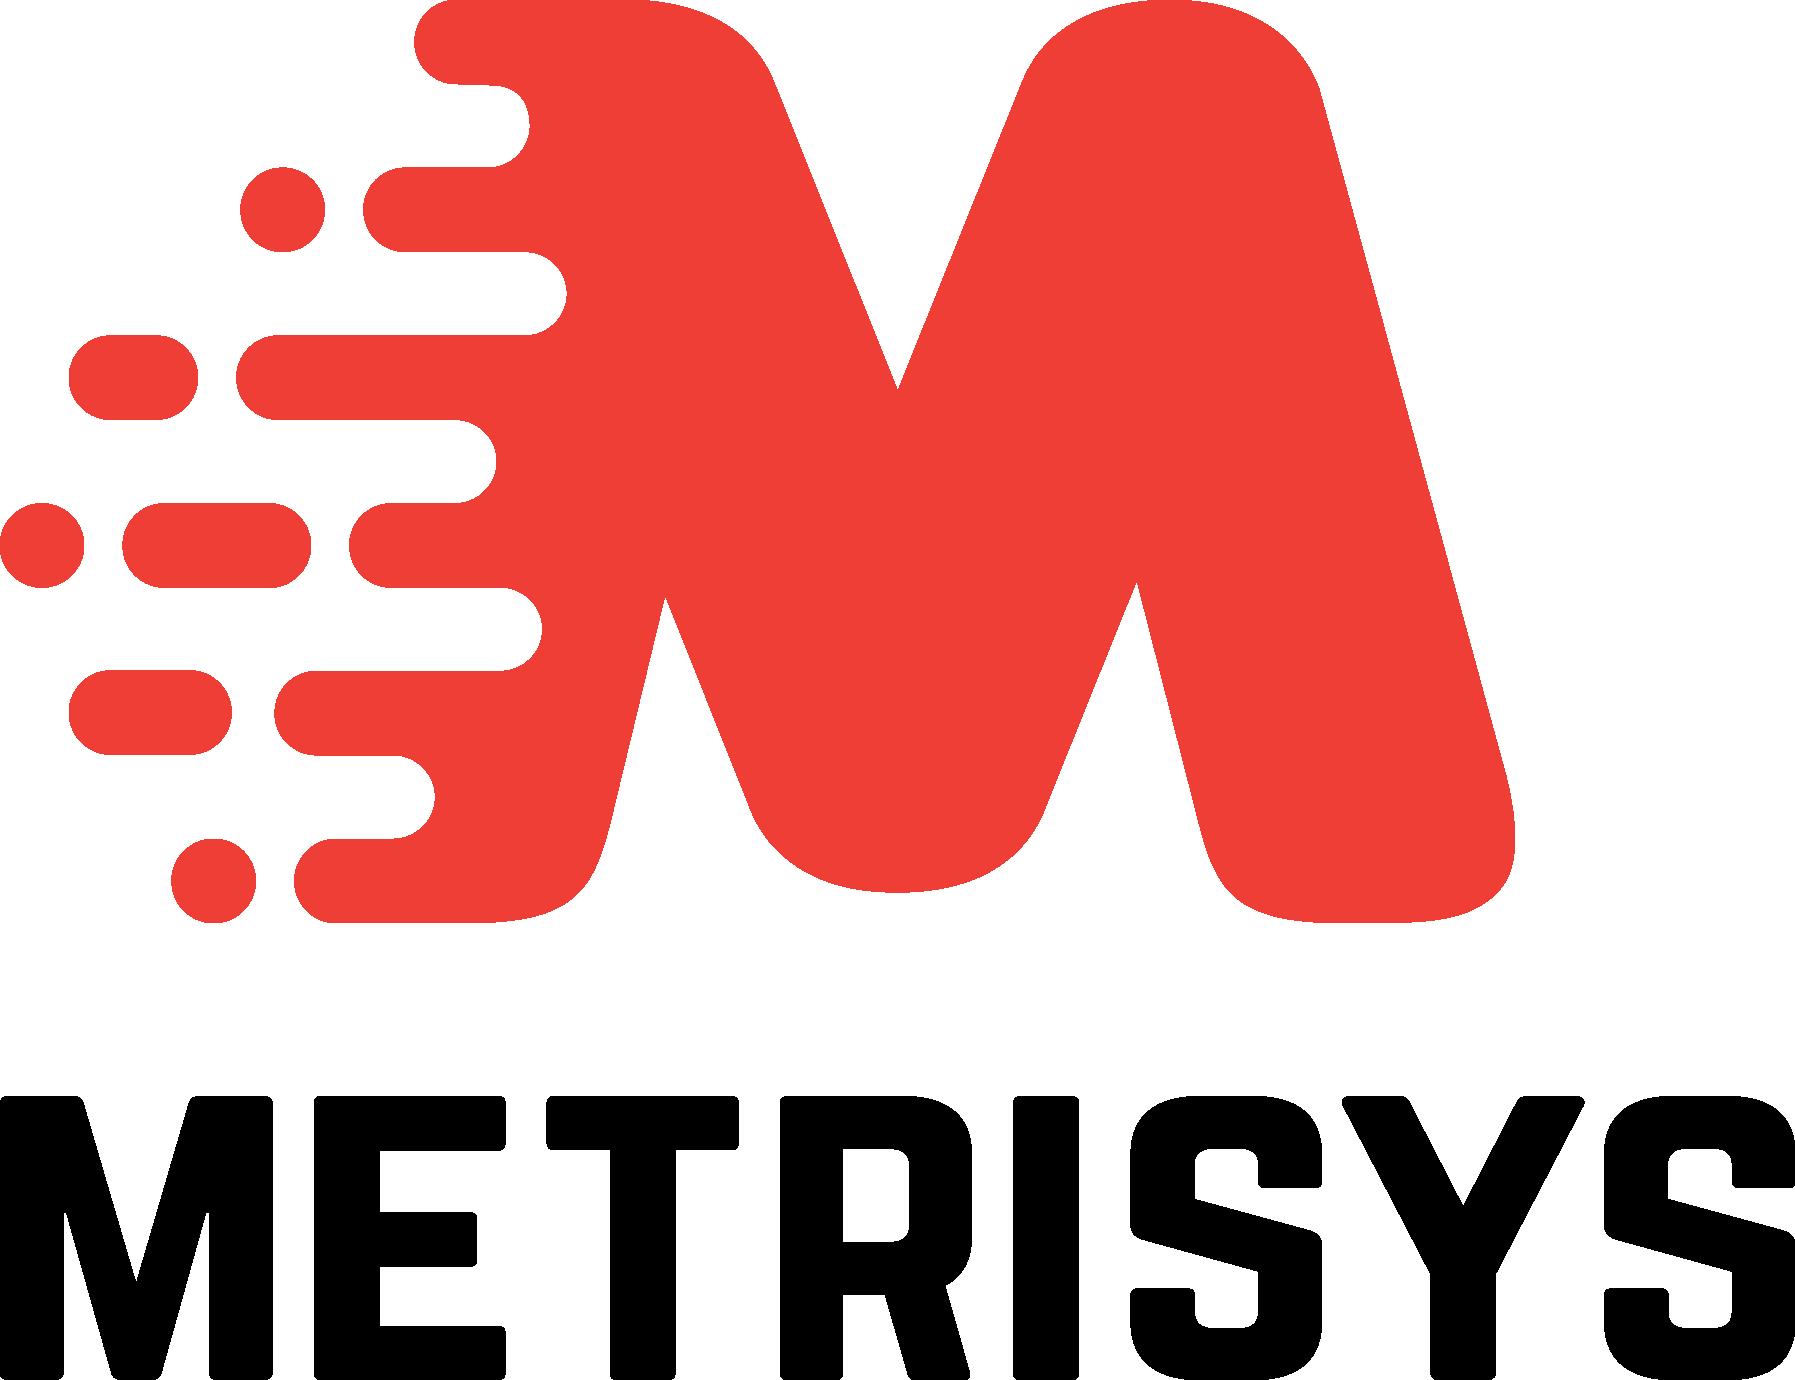 Metrisys